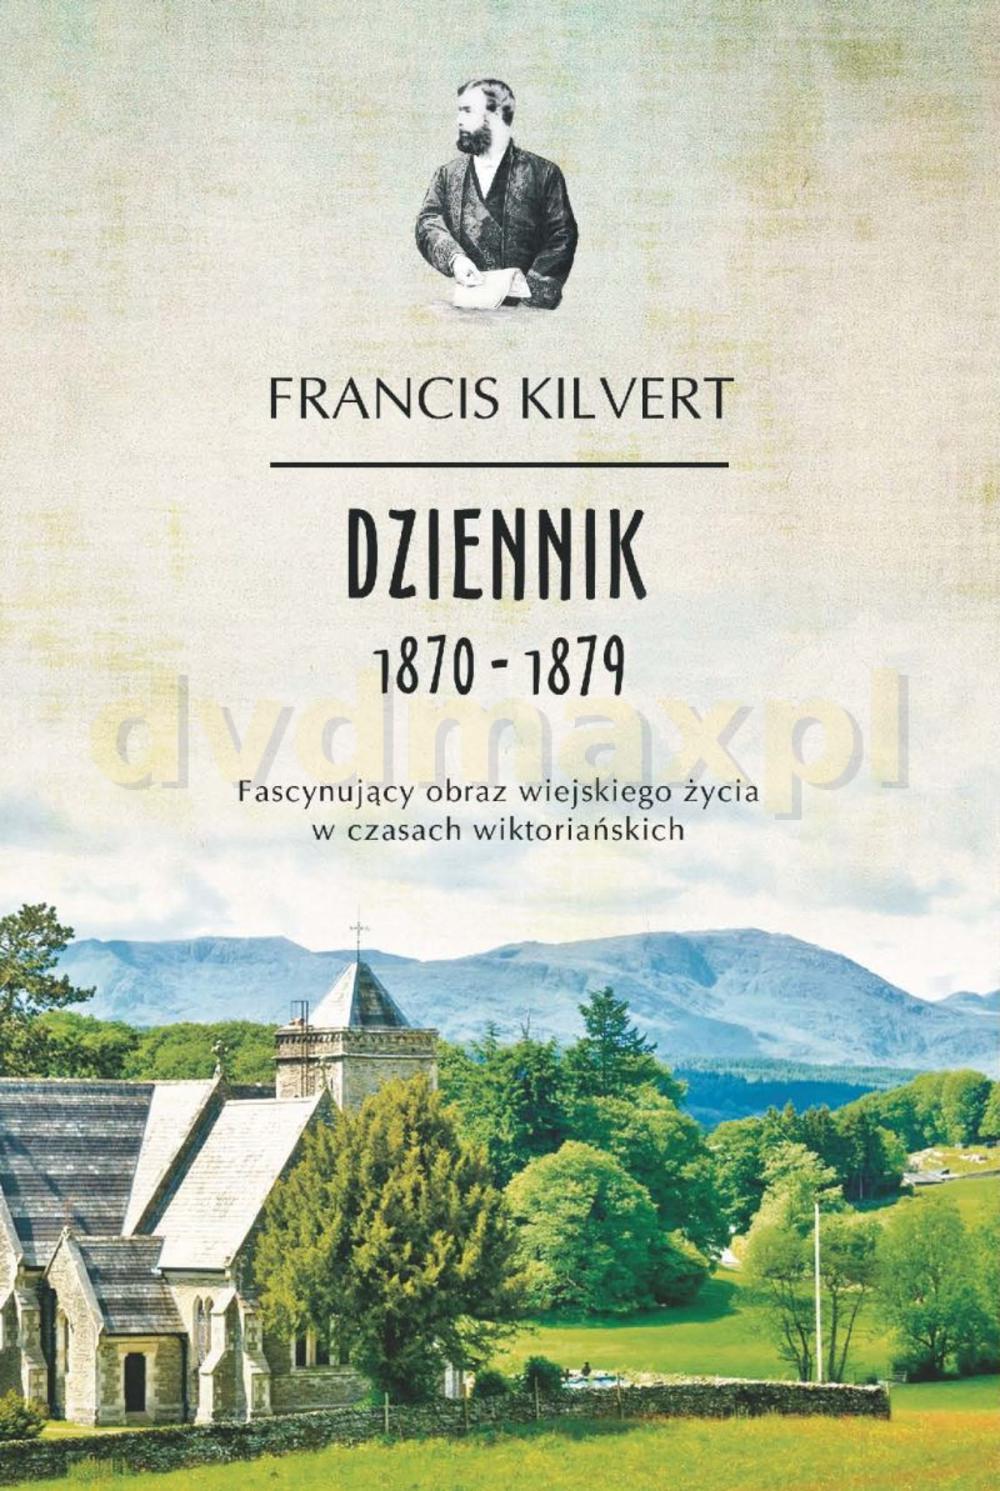 Dziennik - Francis Kilvert (twarda) [KSIĄŻKA] - Francis Kilvert